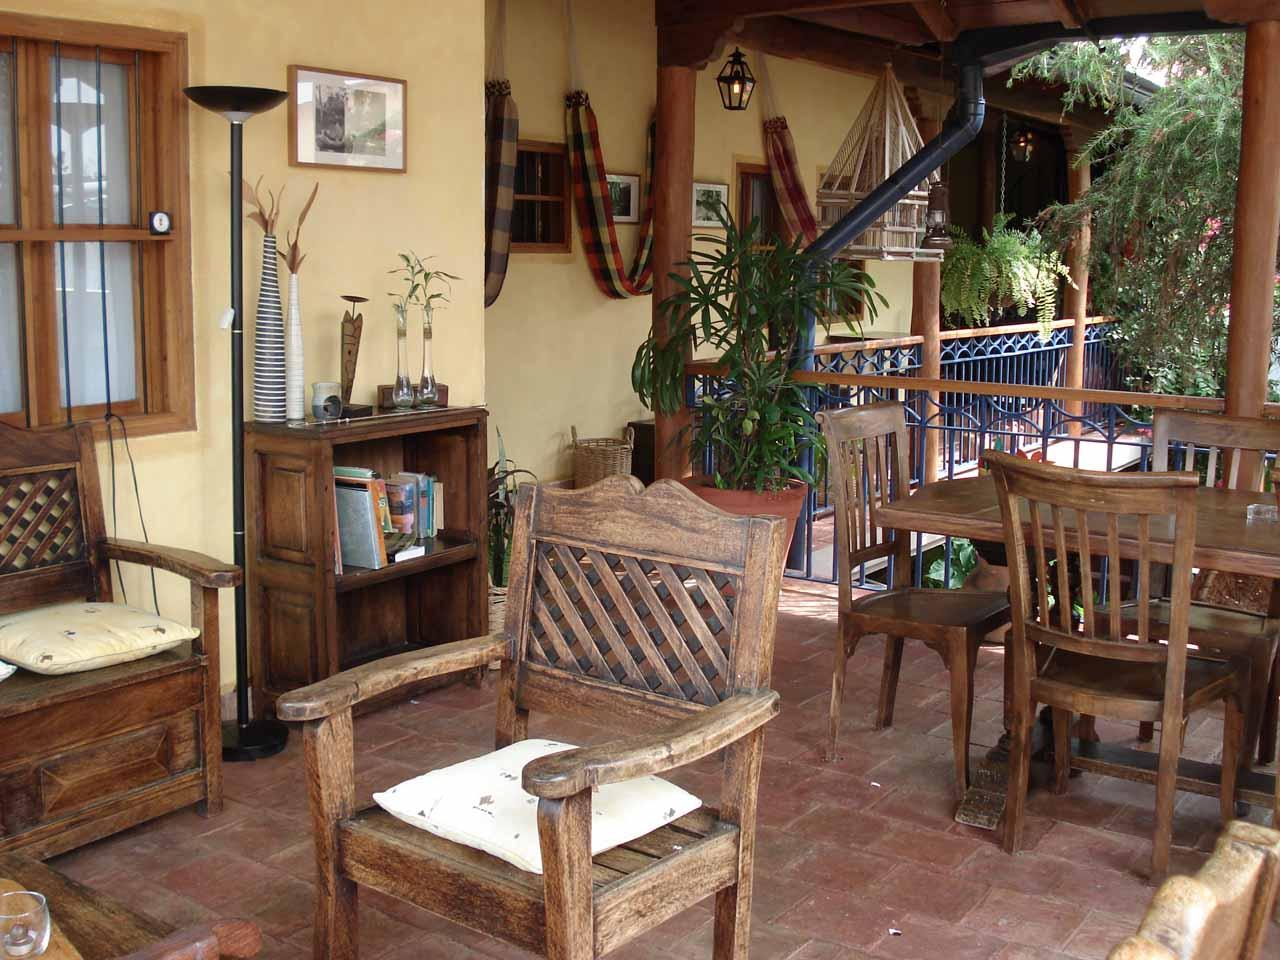 The charming lobby area of Posada Angostura